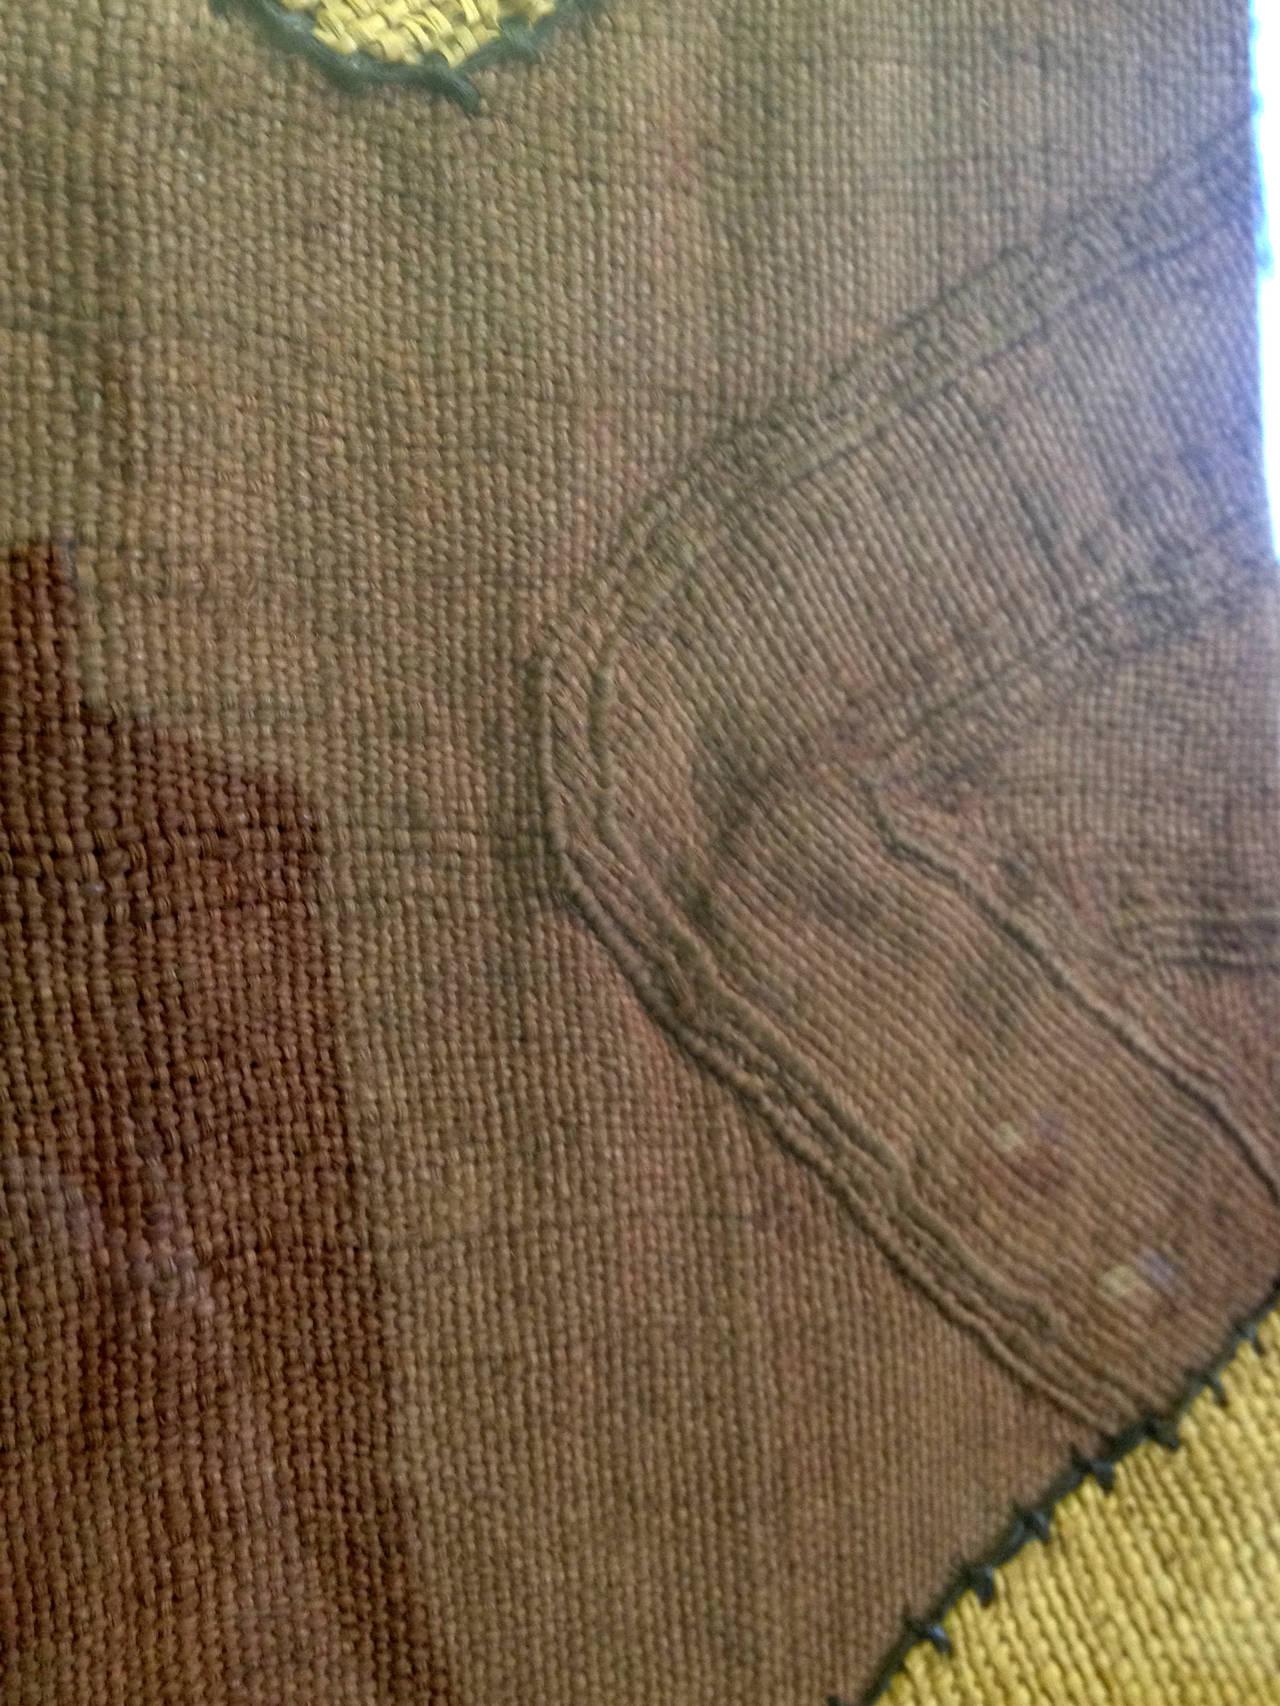 20th Century Impressive Large African Kuba Cloth, Framed